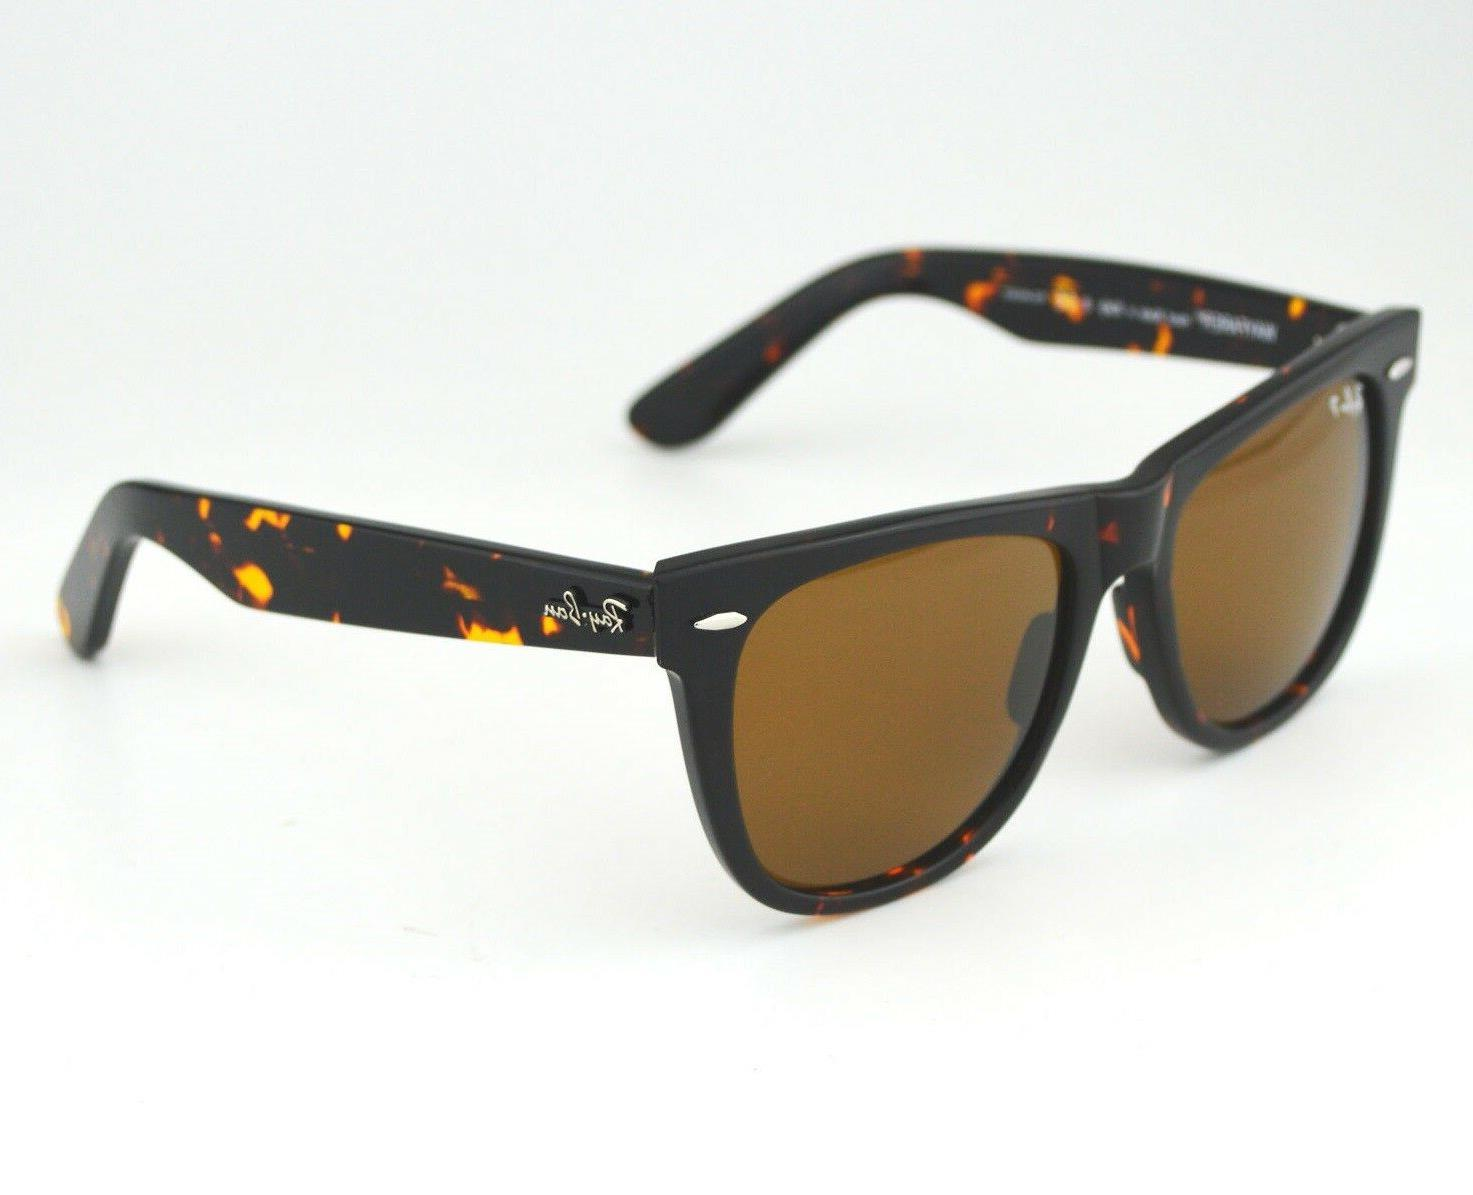 rb2140 wayfarer polarized sunglasses 902